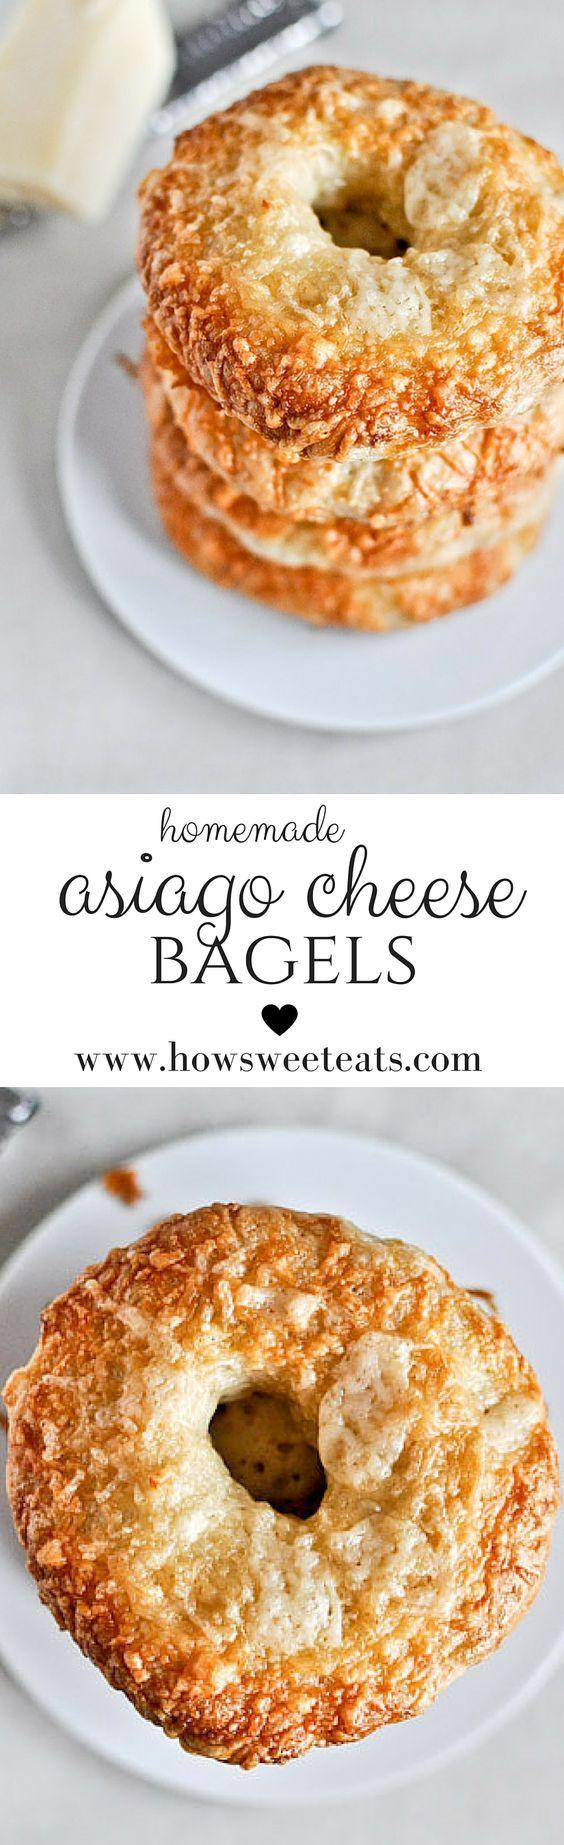 homemade asiago cheese bagels I howsweeteats.com